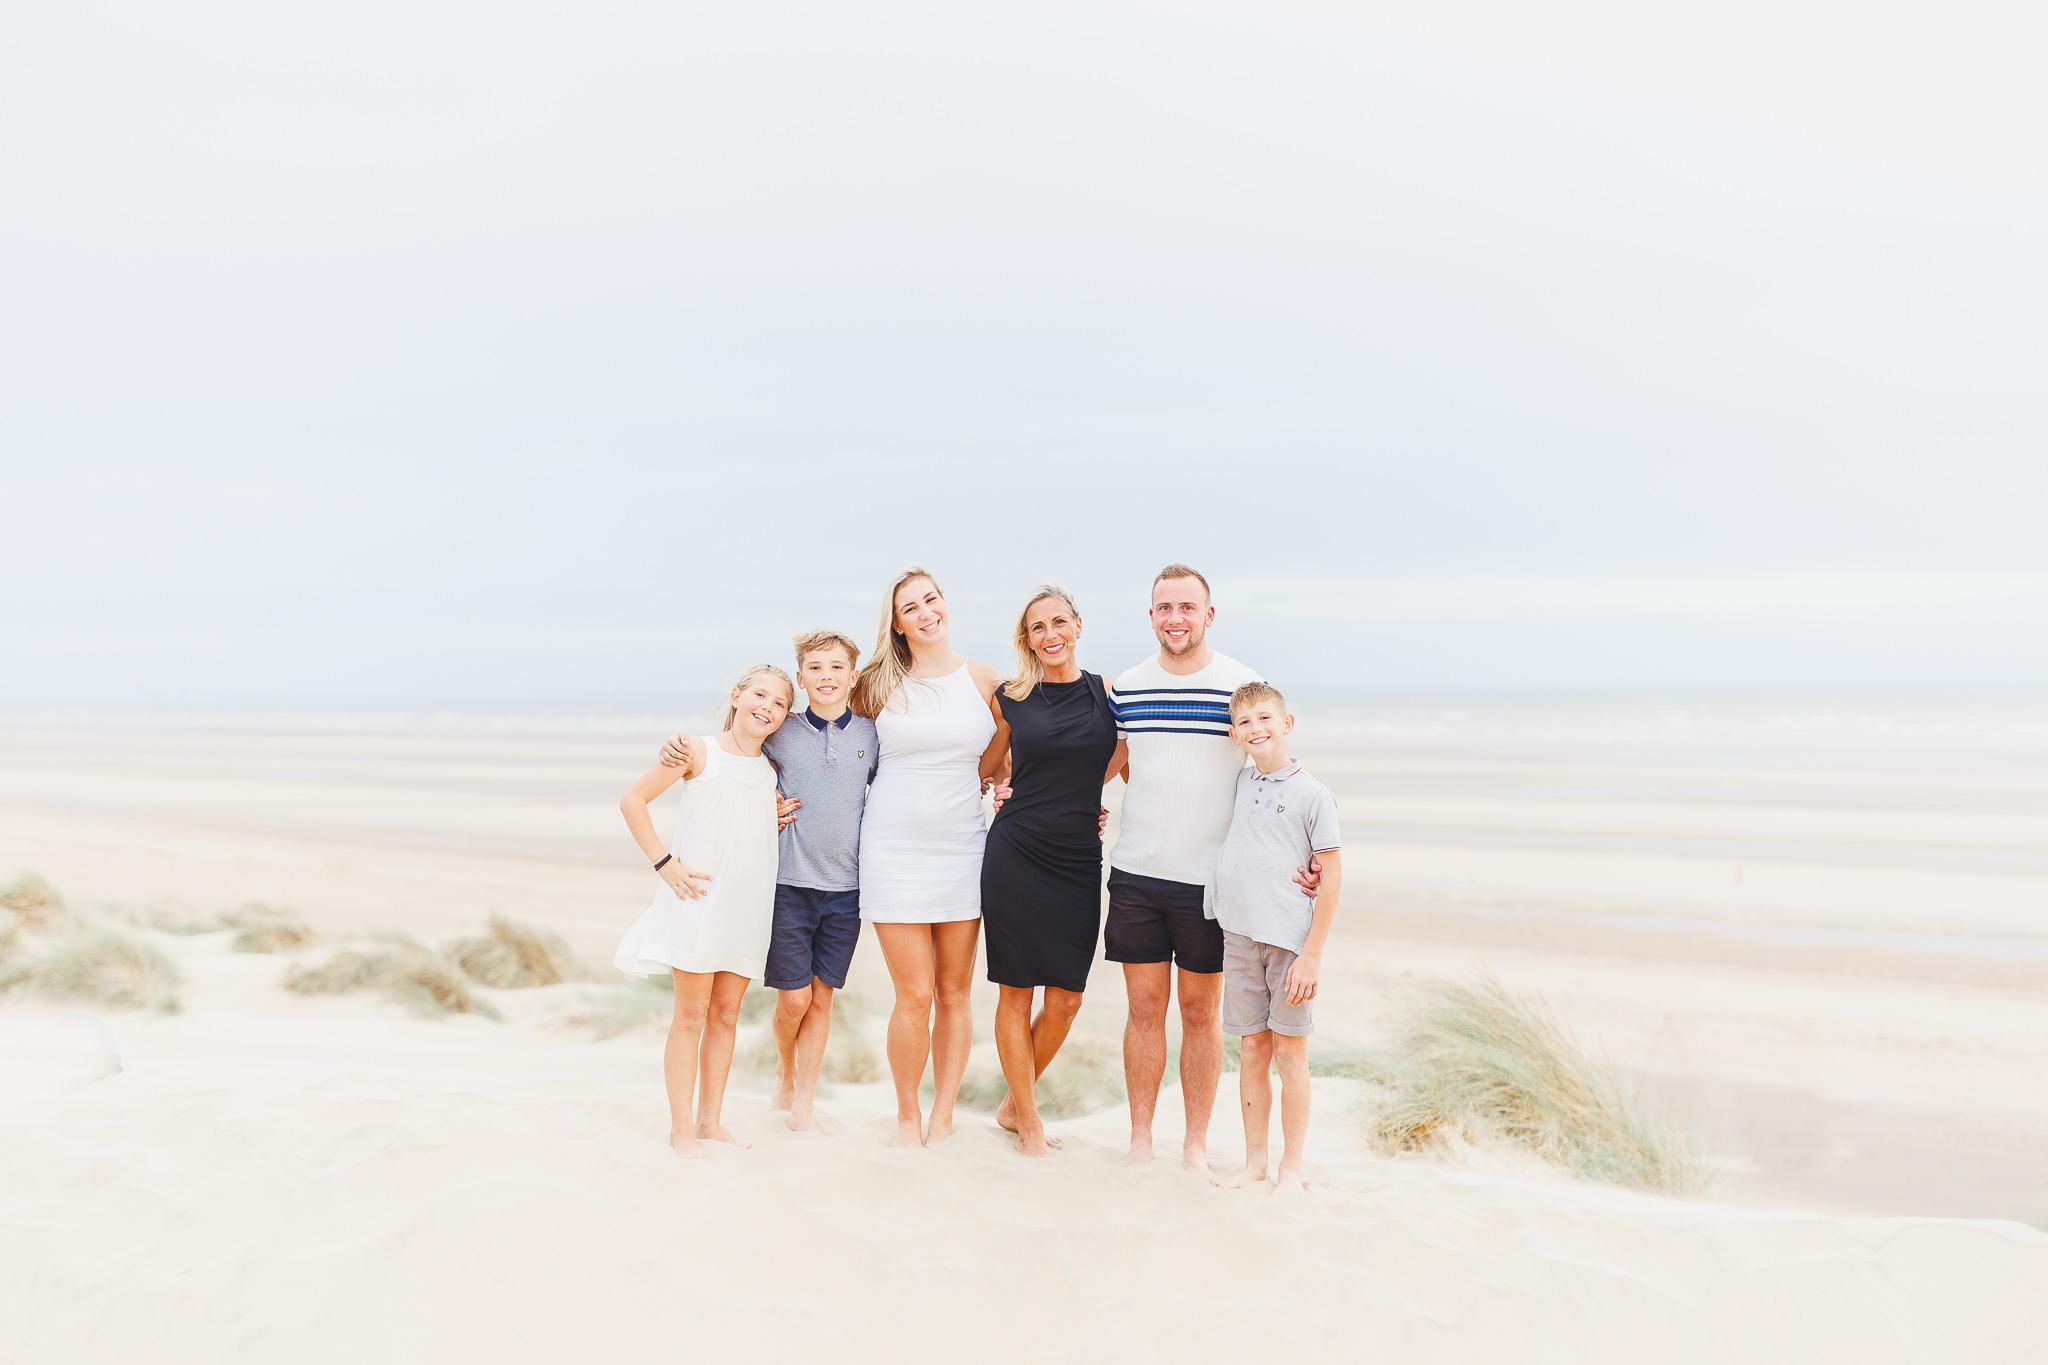 Carly & Family-64-web.jpg